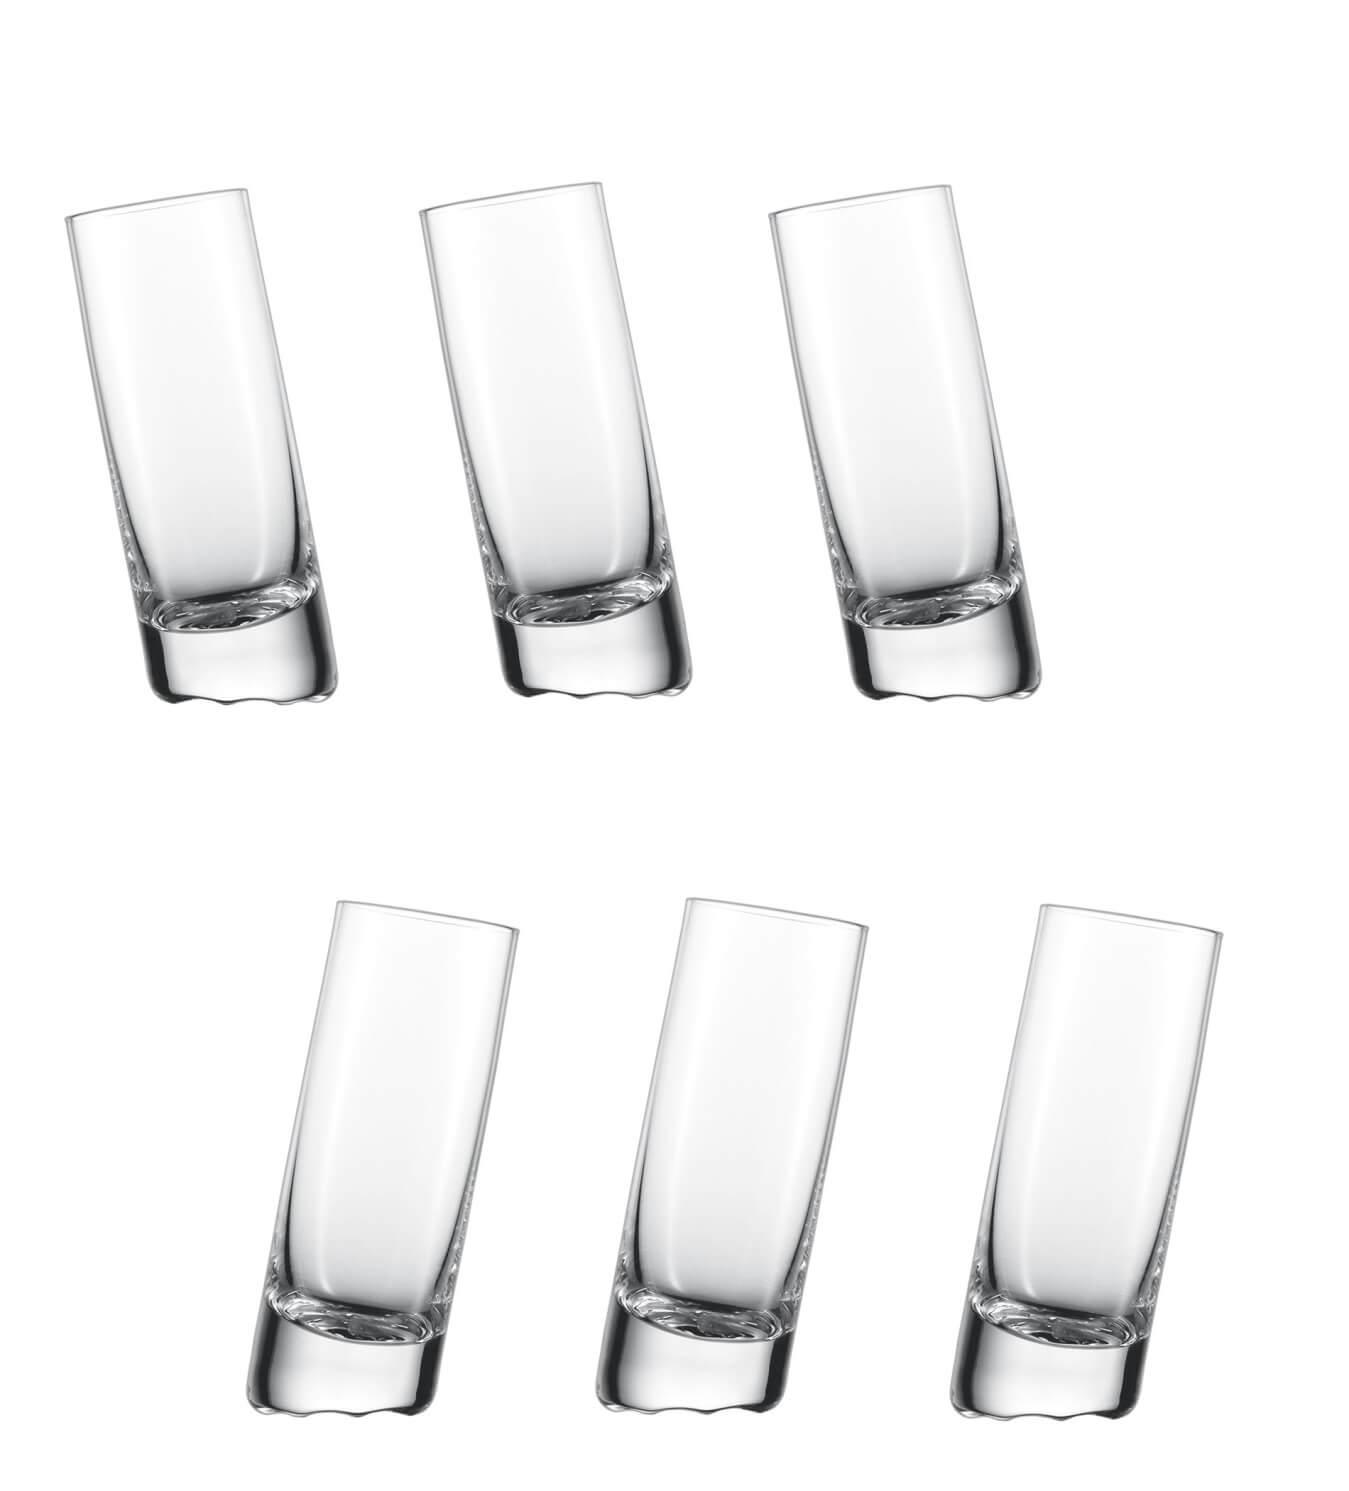 Онлайн каталог PROMENU: Набор стопок Schott Zwiesel 10 Grad, объем 0,074 л, прозрачный,  6 штук Schott Zwiesel 145046_6шт